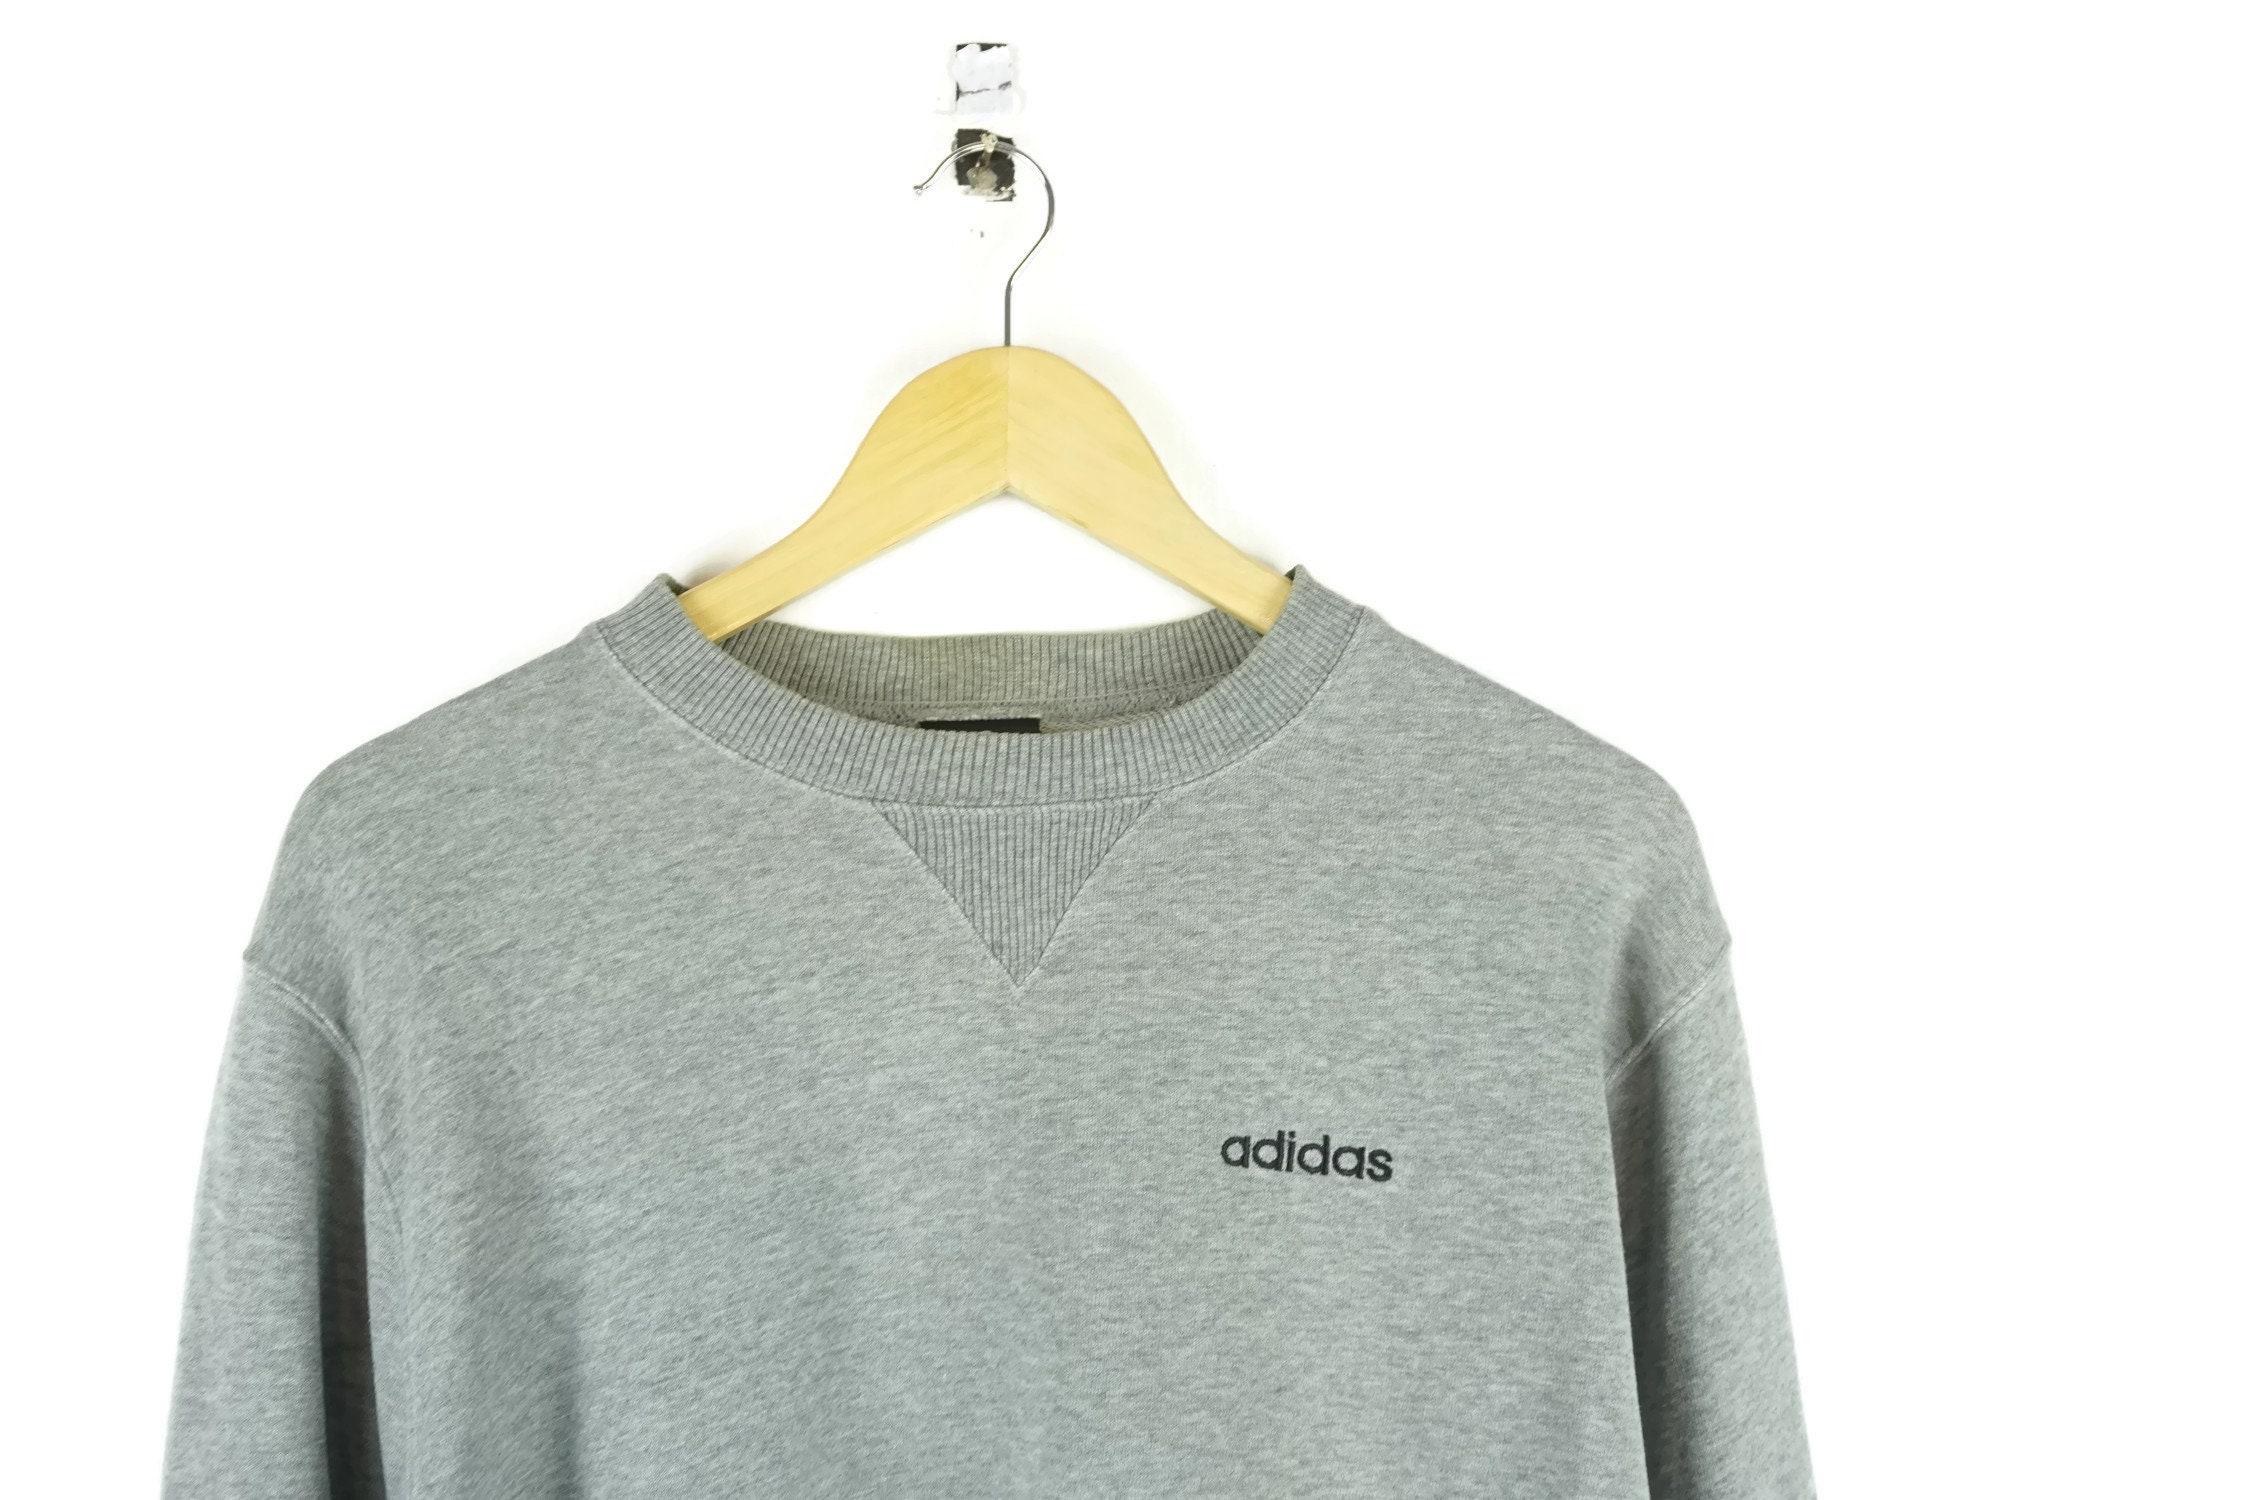 Aesthetic Sweater Sweatshirt Vintage Preppy Adidas Grey Clothing kn0w8OP